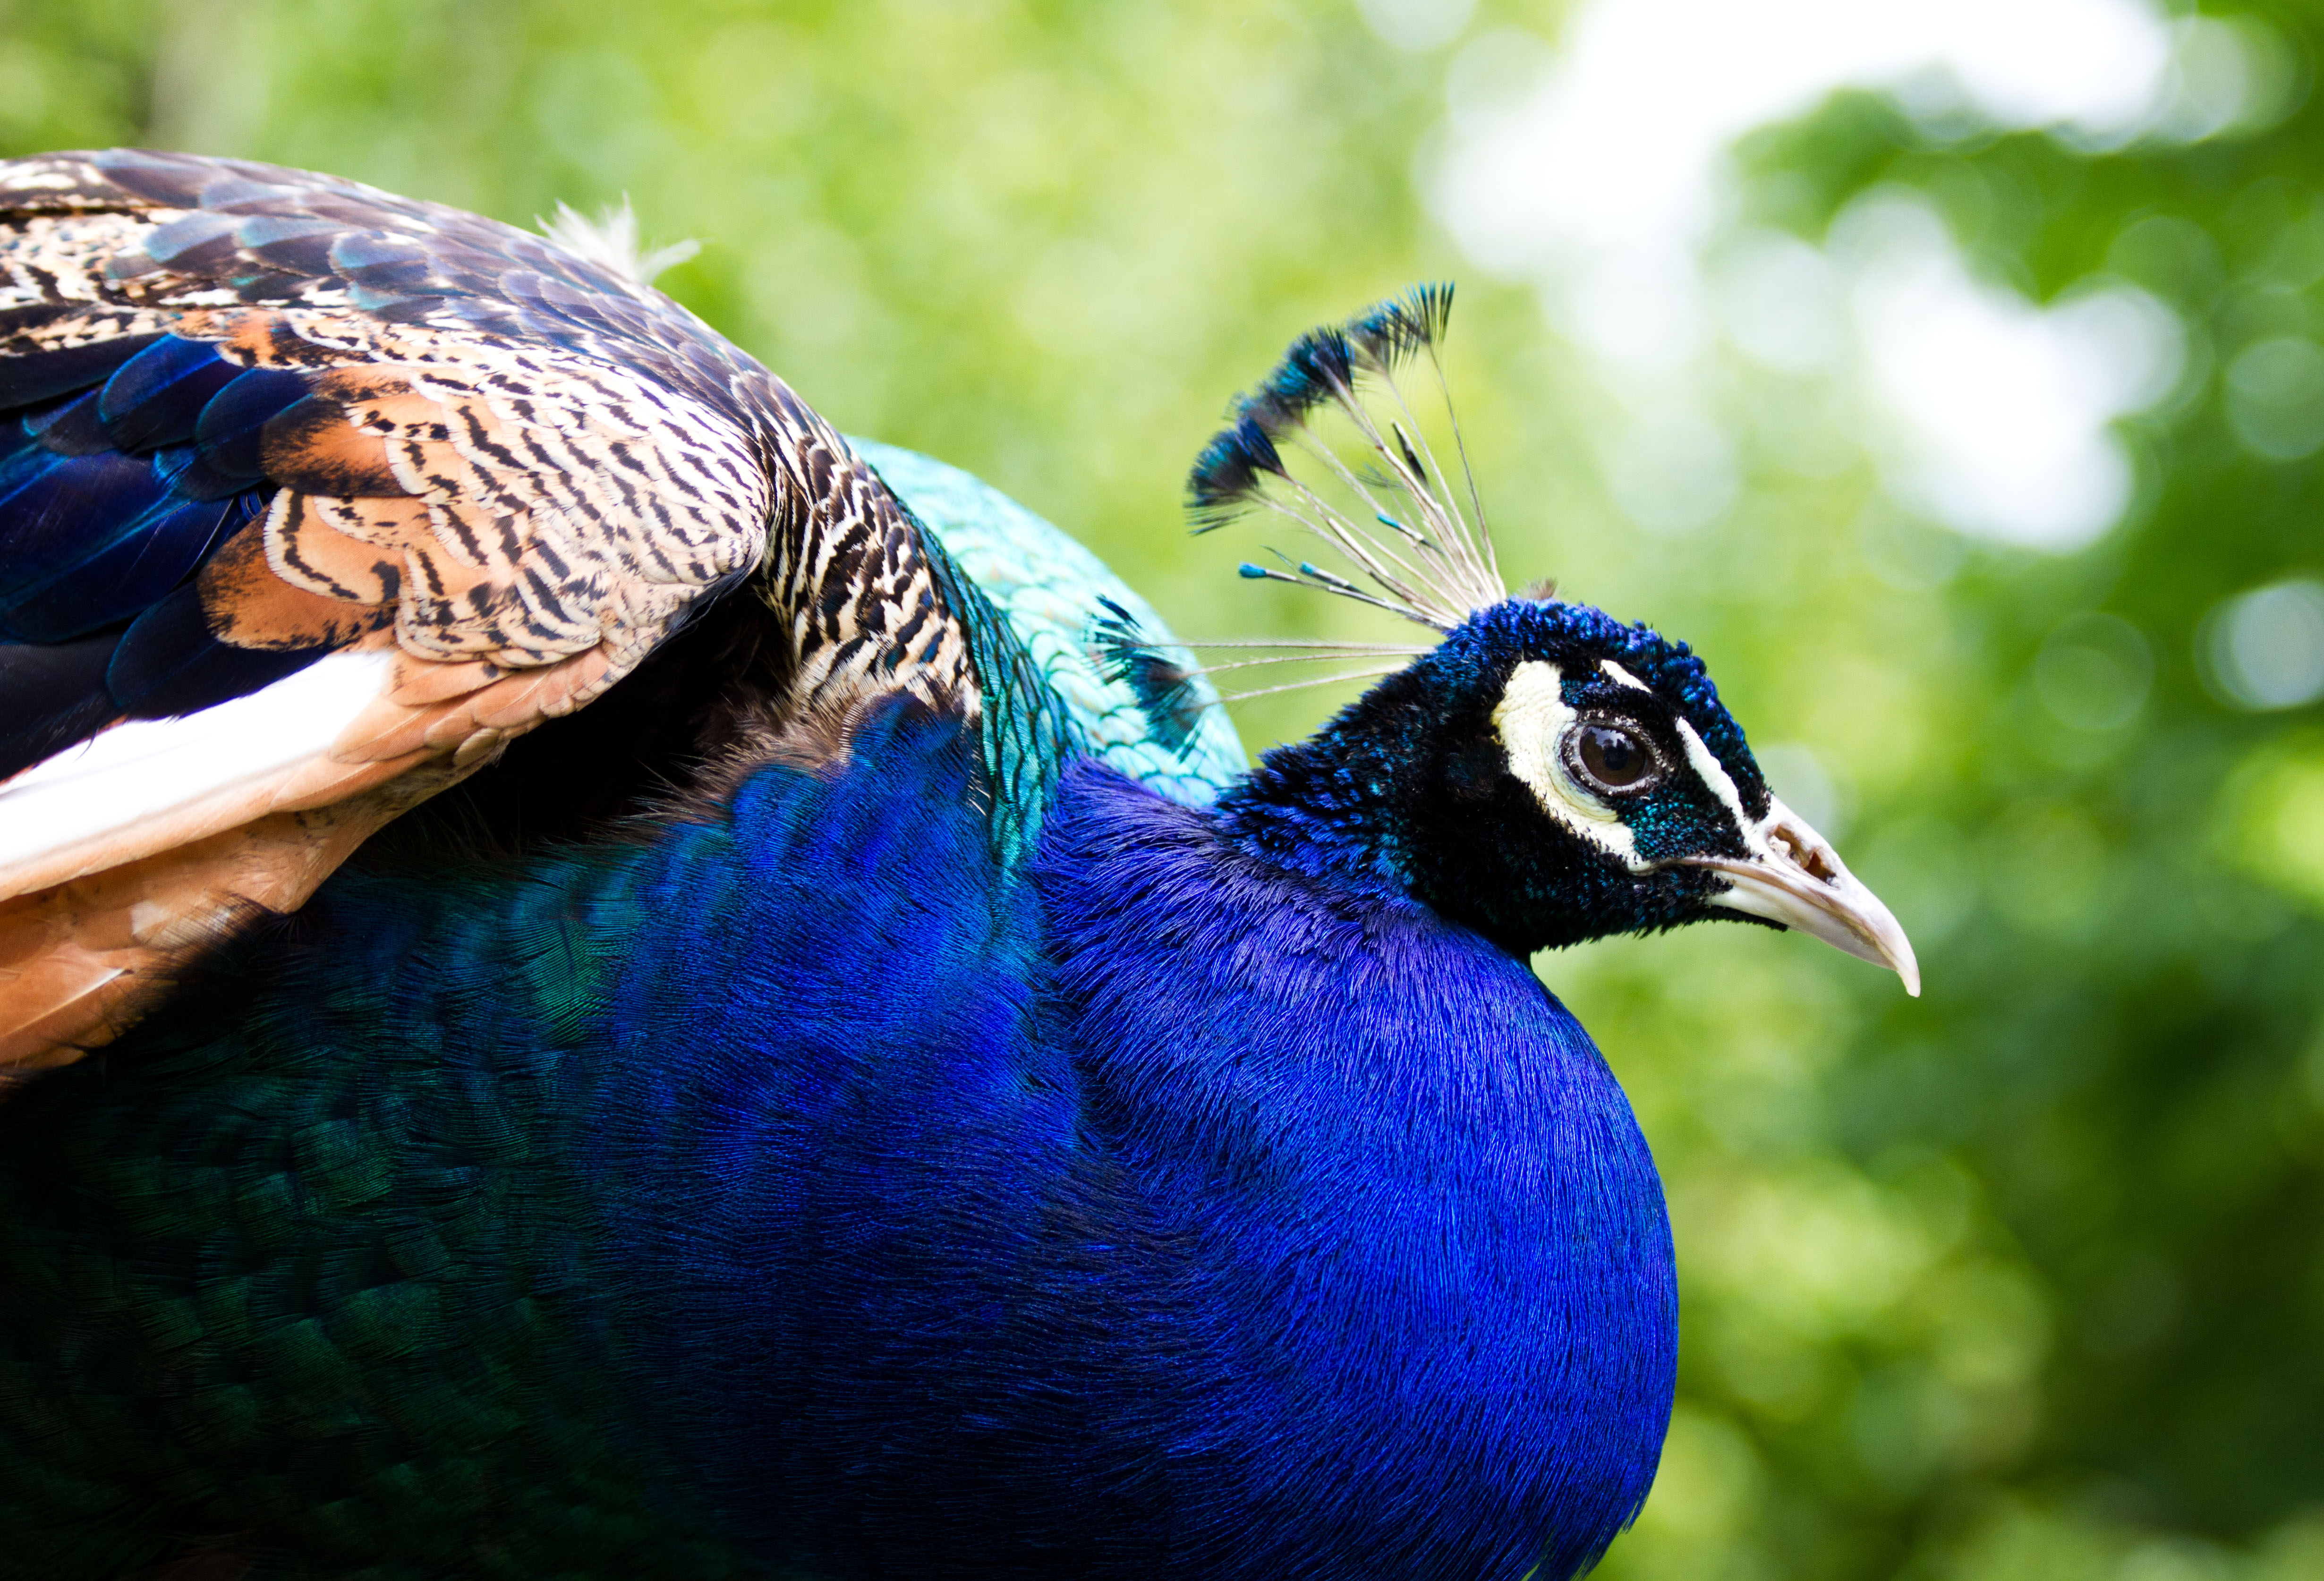 Peacock in spotlight by P-LinsenerFotografie